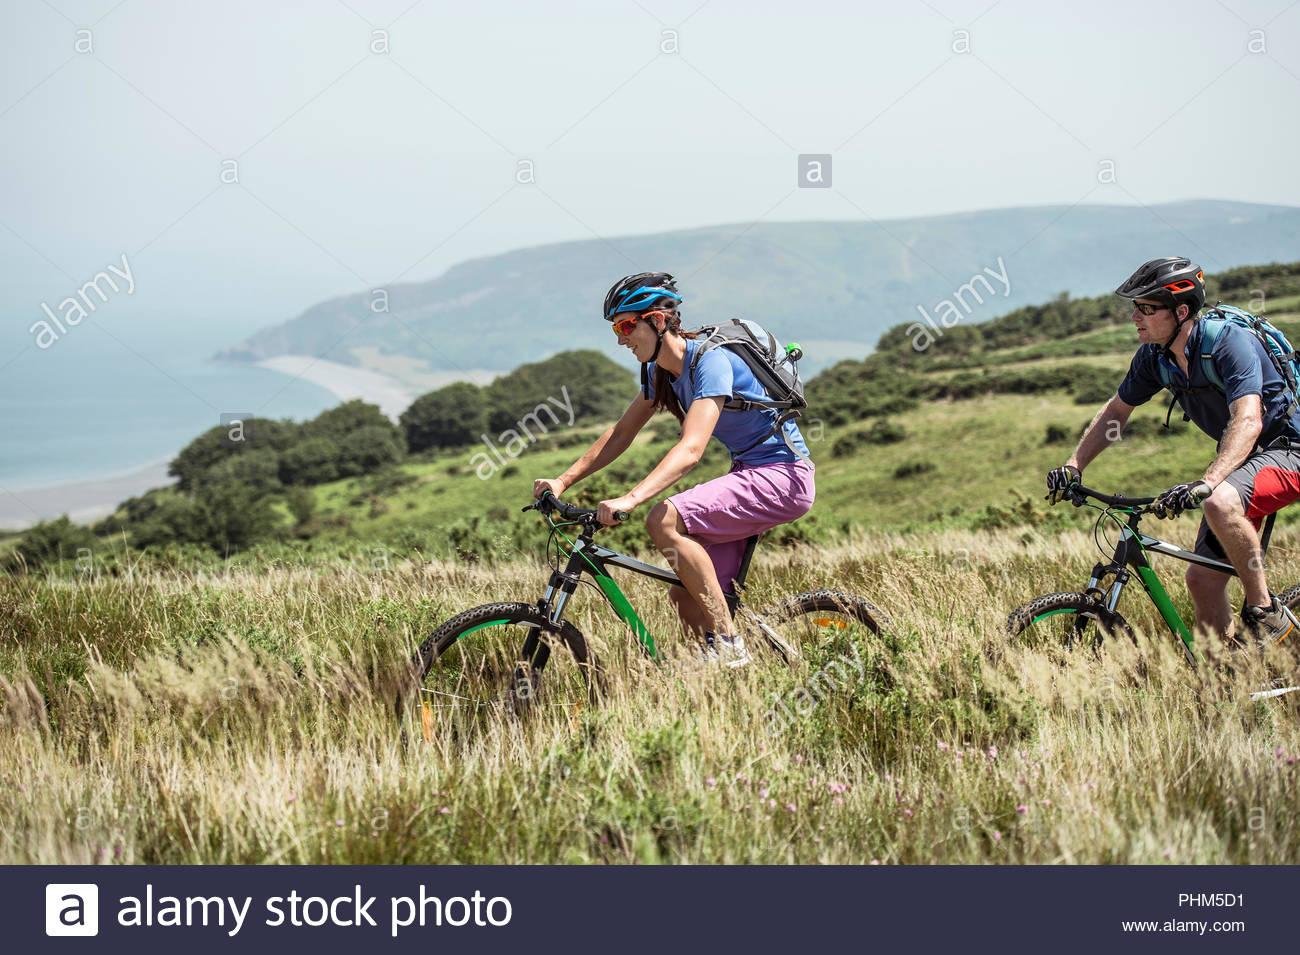 Matura in mountain bike sulla collina di Porlock Weir, Inghilterra Immagini Stock